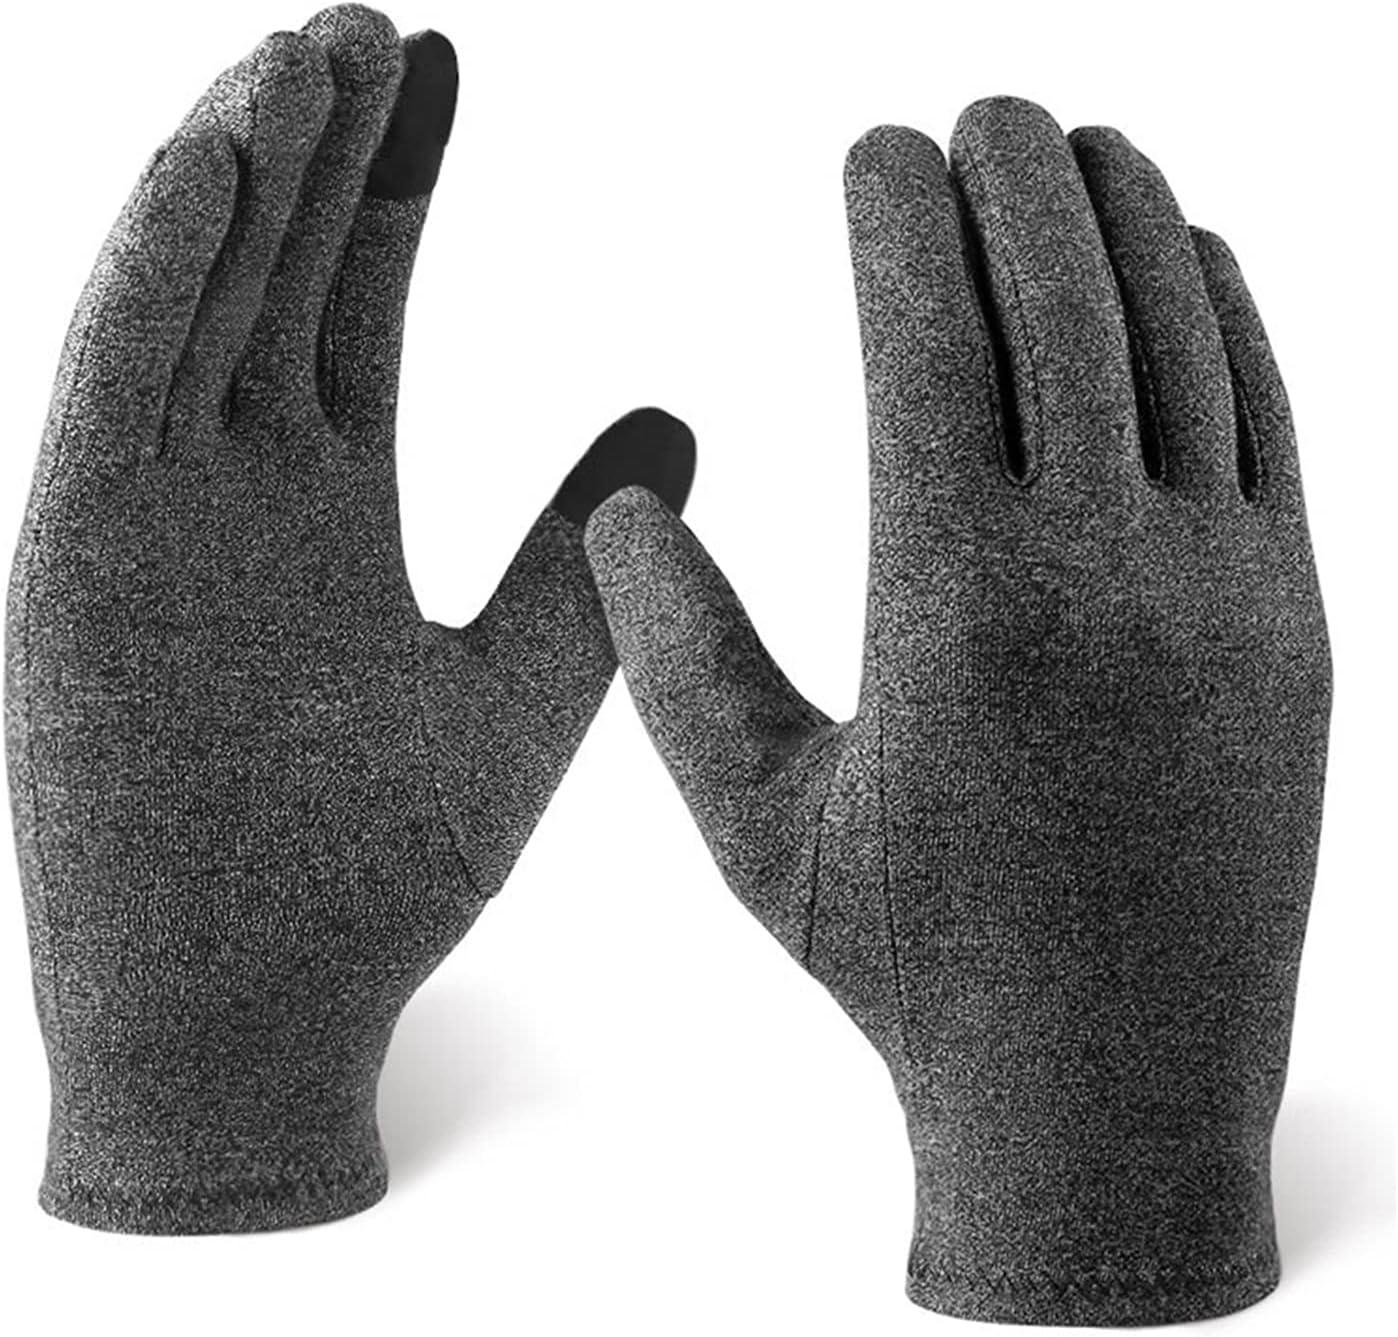 ZEMIN 1 Pair discount Arthritis Gloves Arthritic Joint Premium Pain Full Free shipping / New